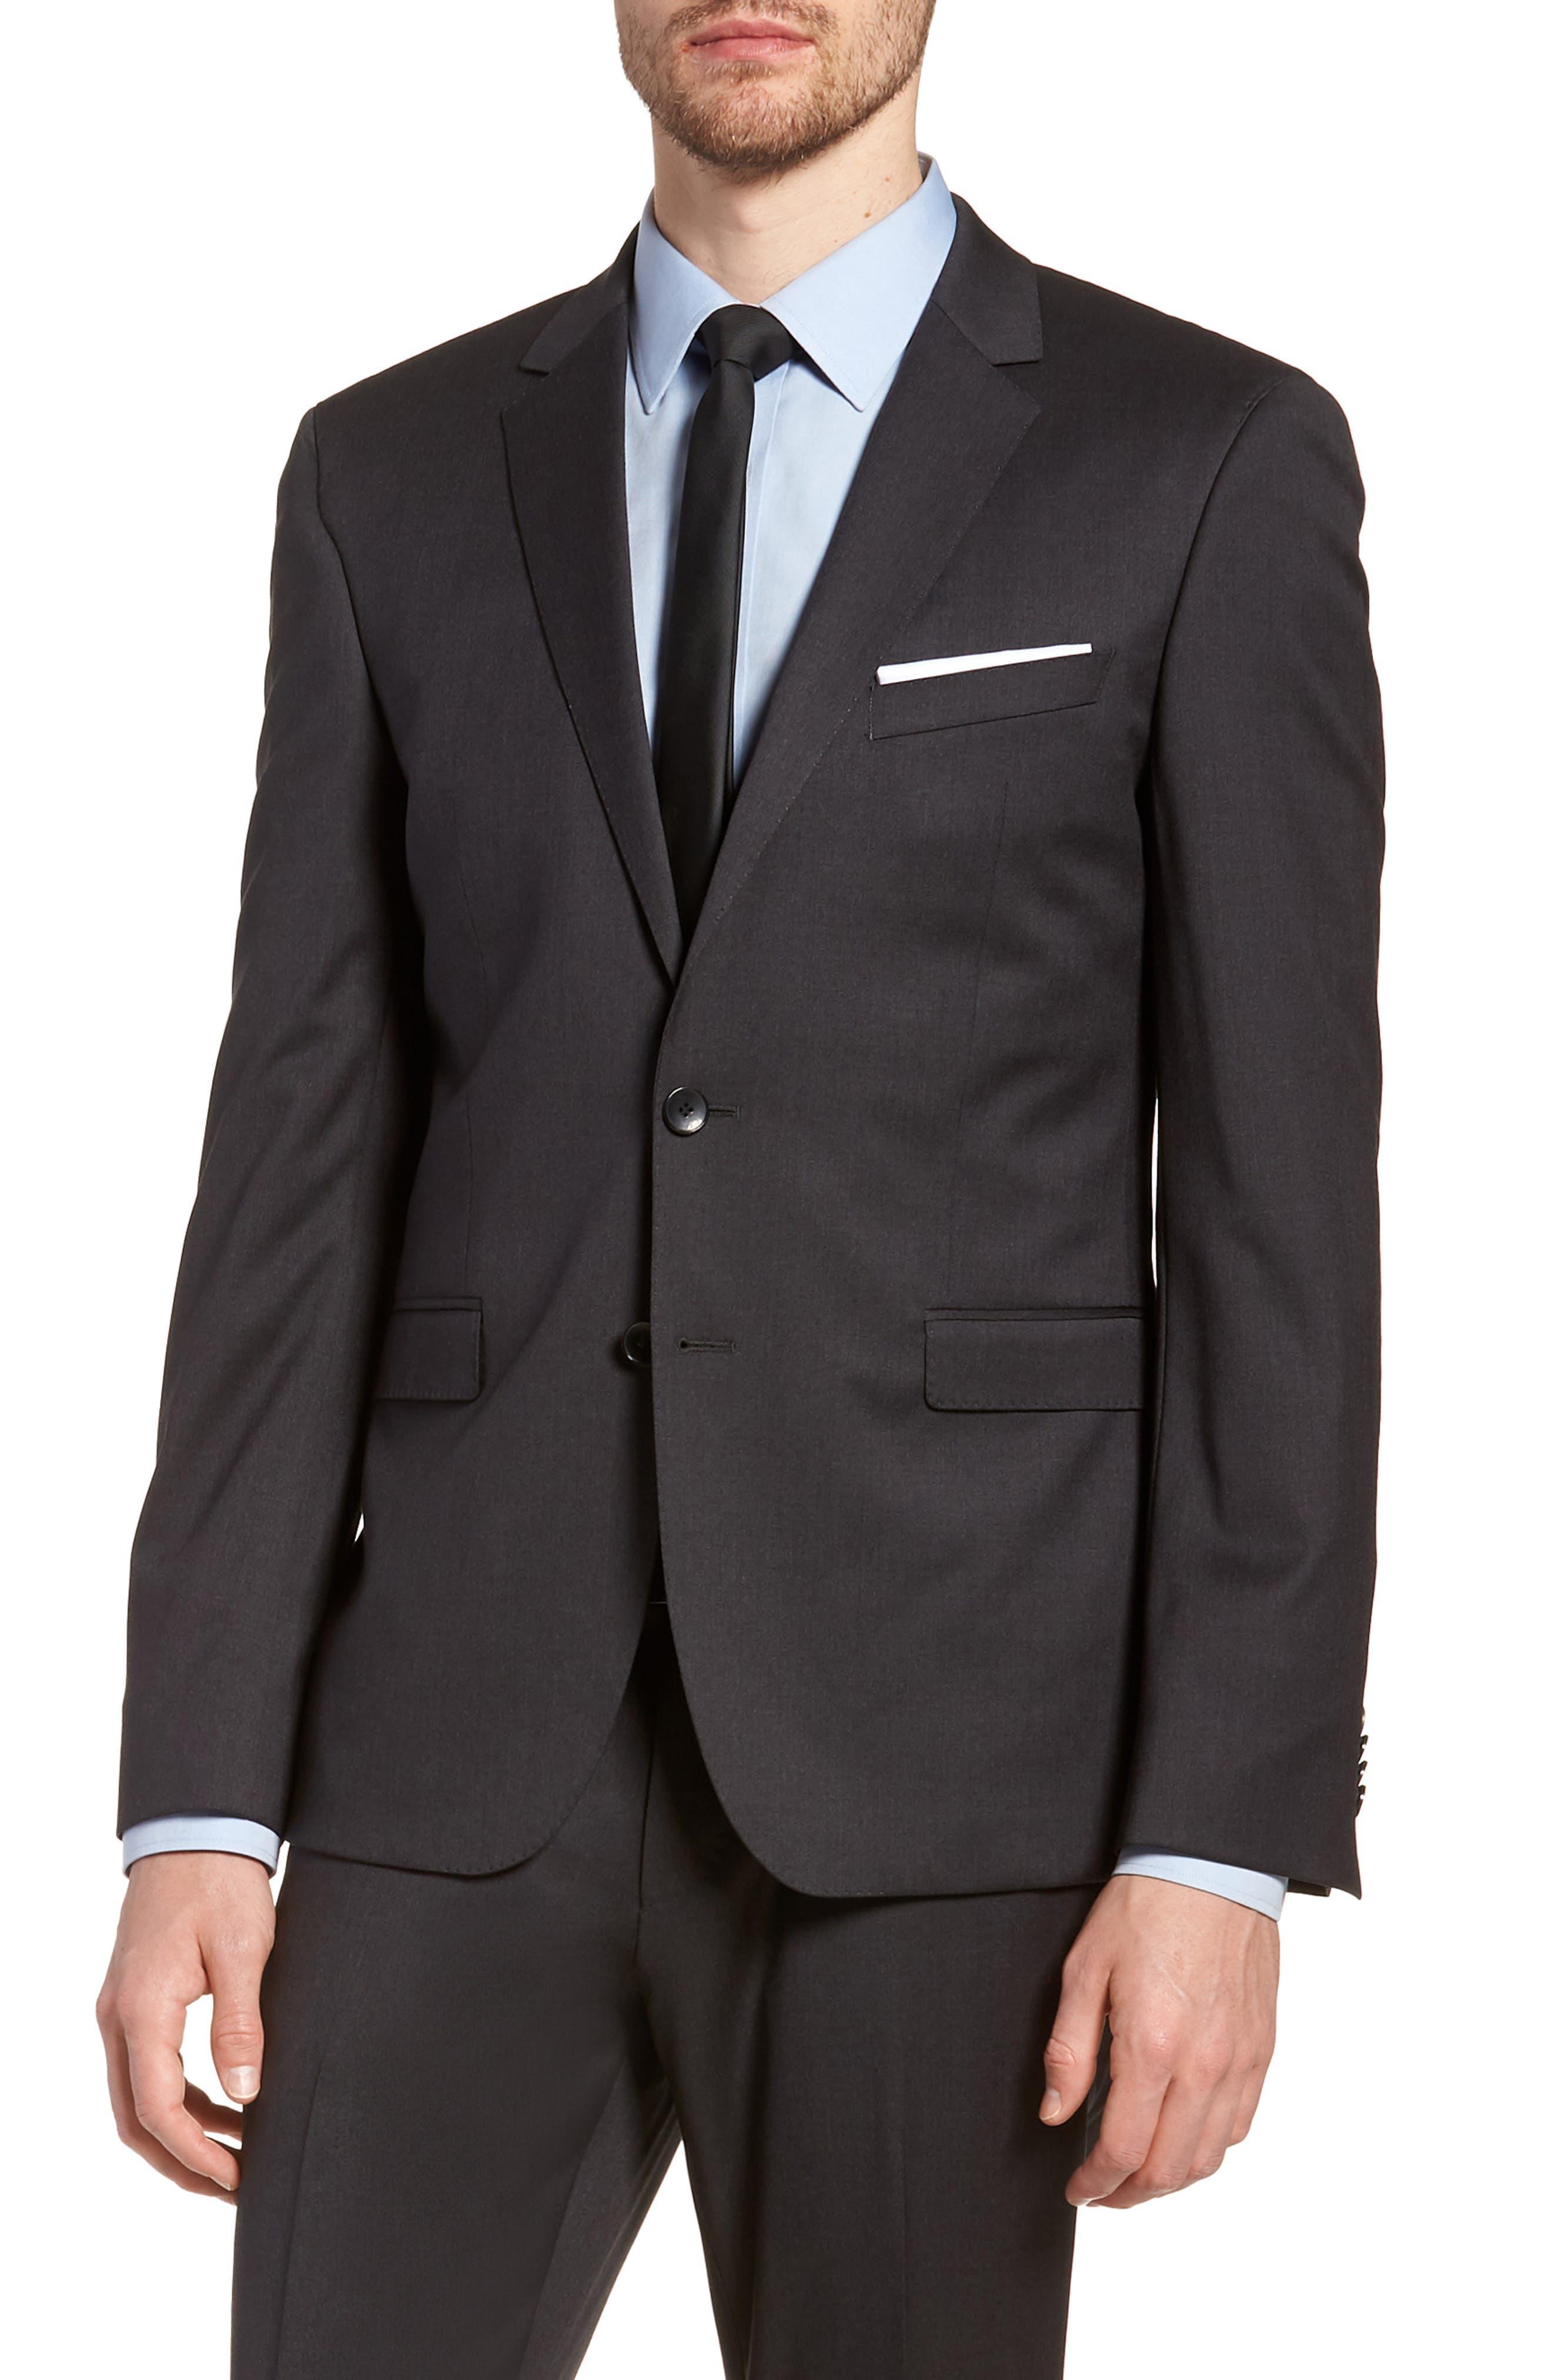 'Ryan/Win' Extra Trim Fit Solid Wool Suit,                             Alternate thumbnail 7, color,                             Dark Grey